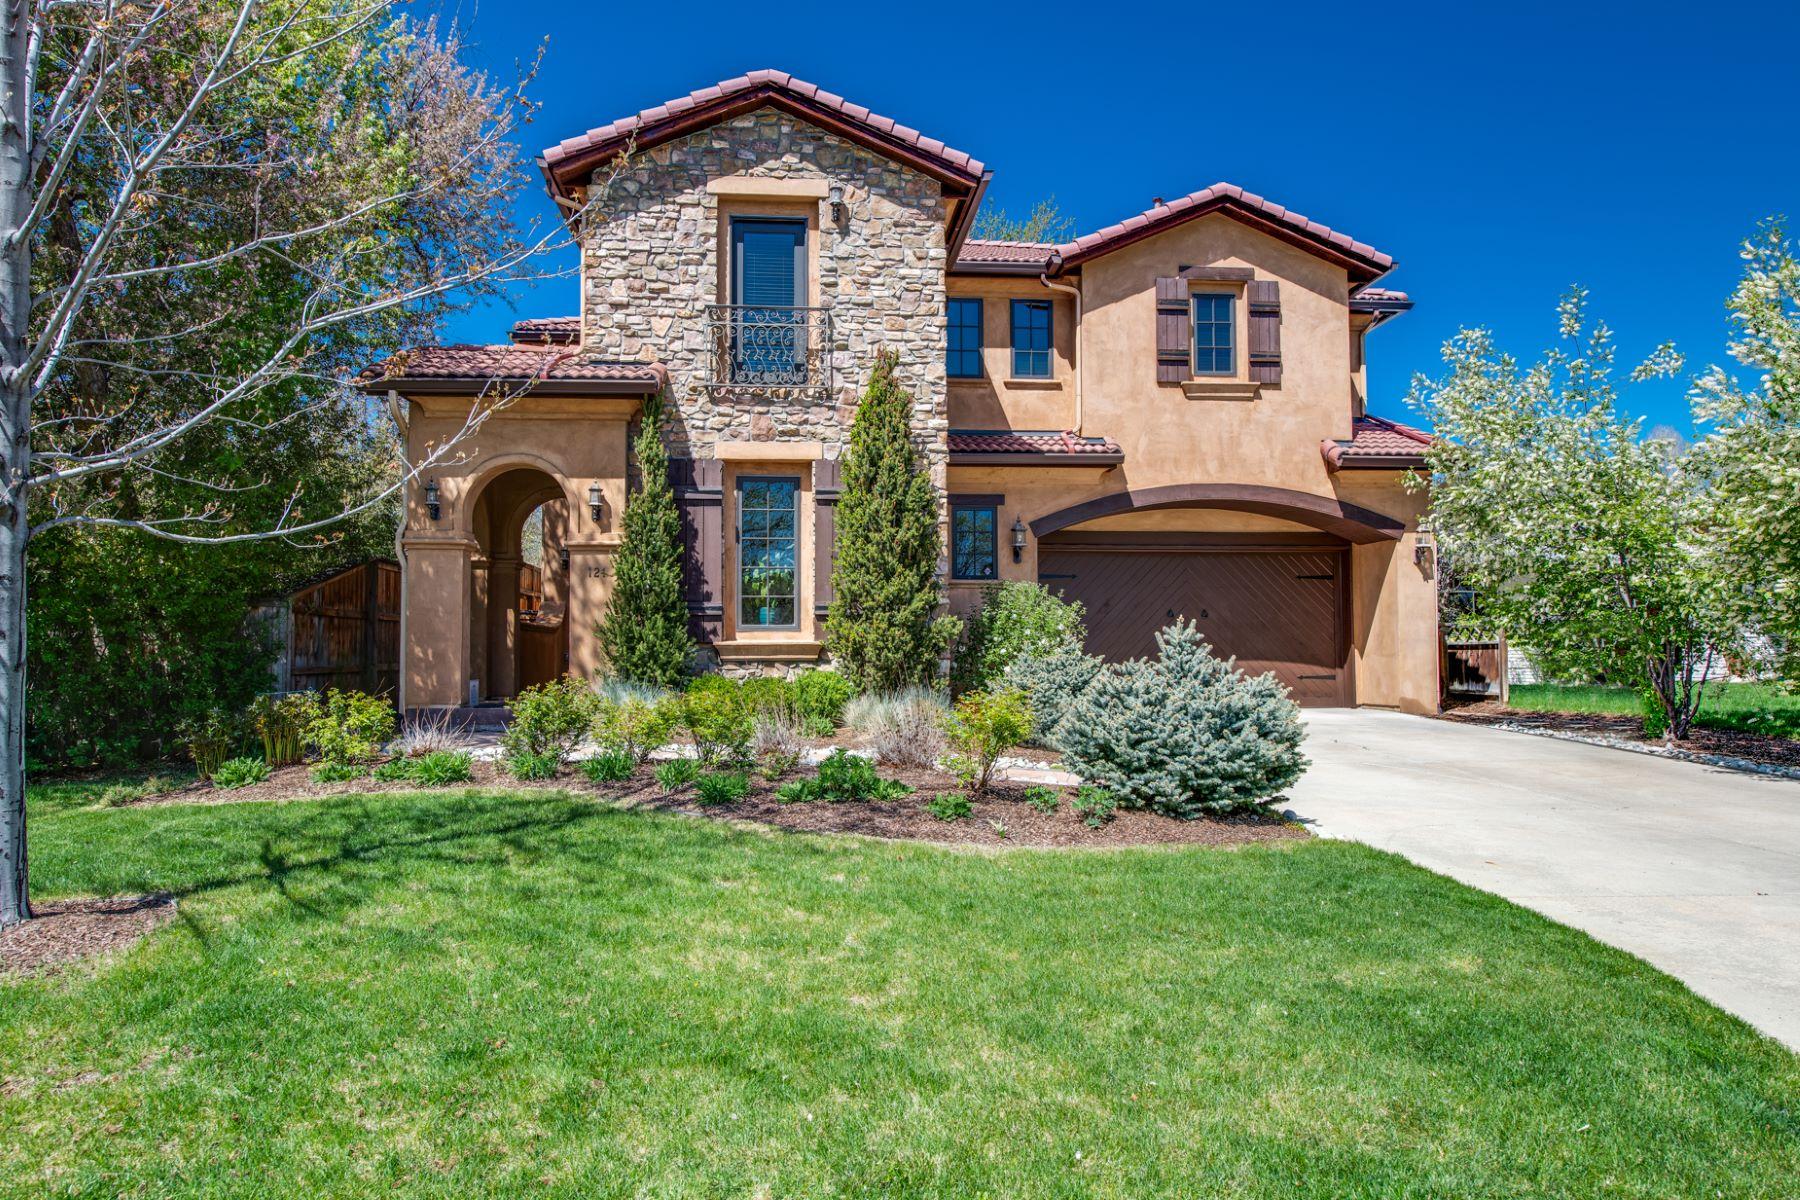 Single Family Home for Active at 121 Elm Street 121 Elm Street Denver, Colorado 80220 United States